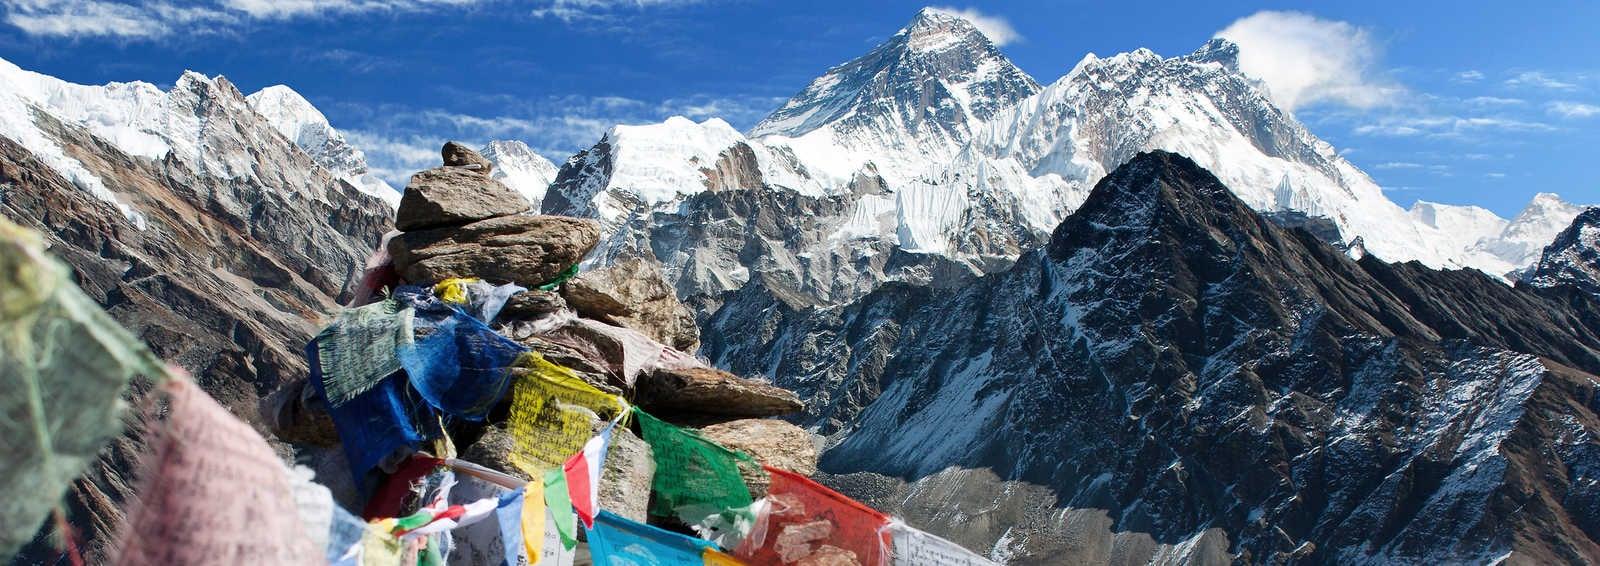 Trekking In Nepal, Nepal Holid...